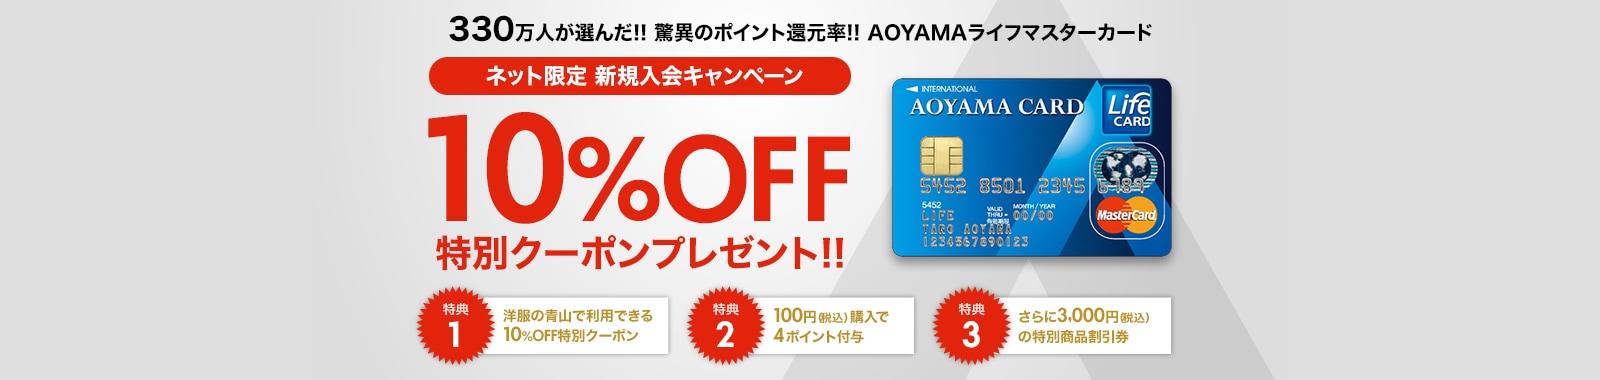 青山カード